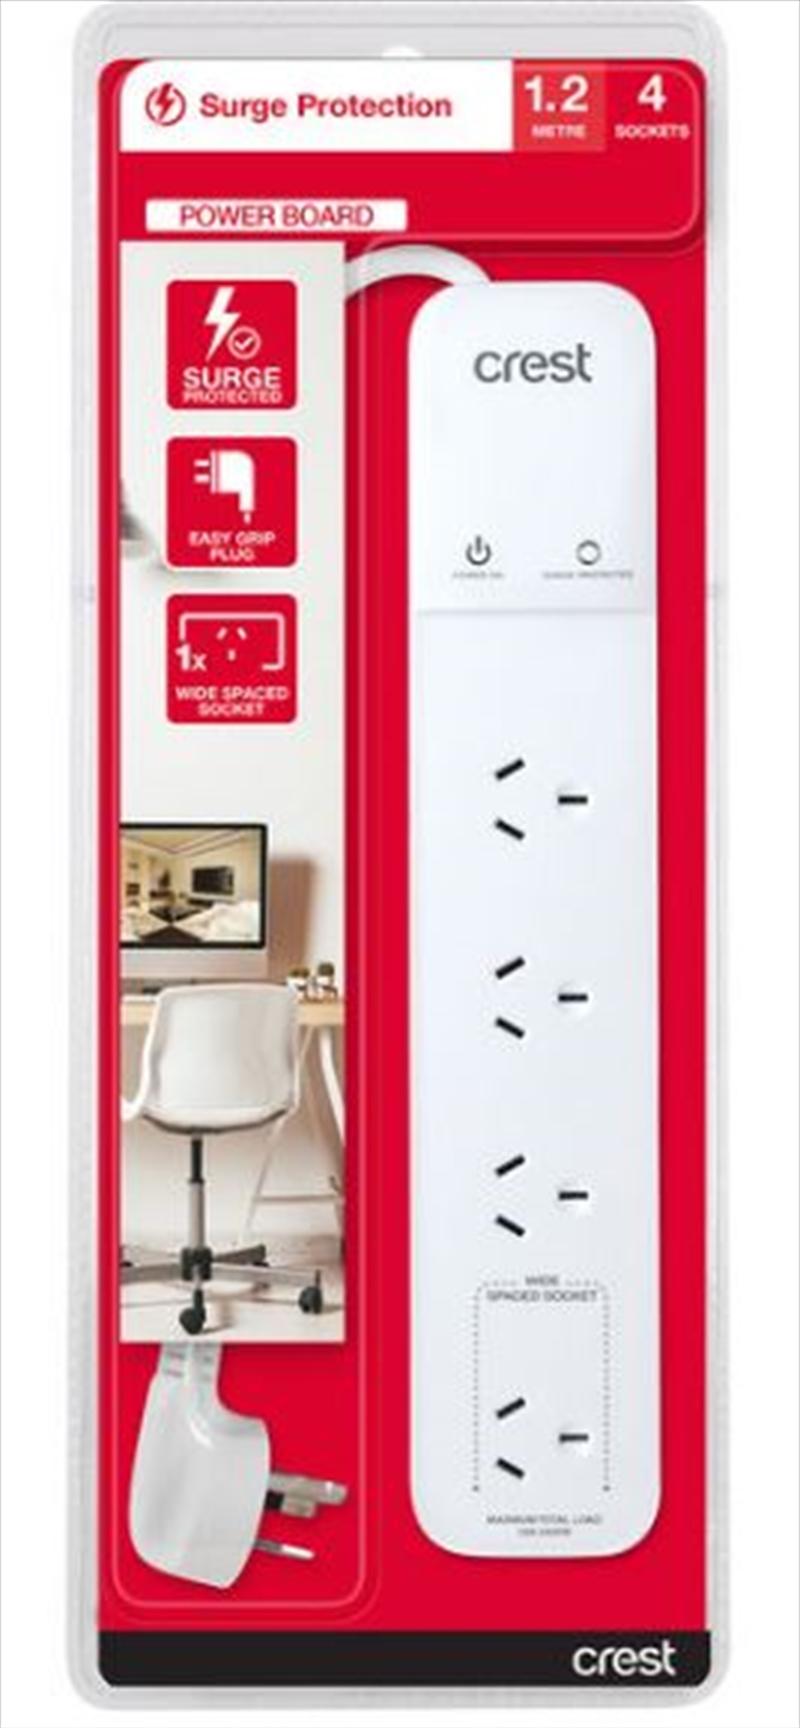 Crest Power Board Surge 4 Sockets - 1.2M   Accessories